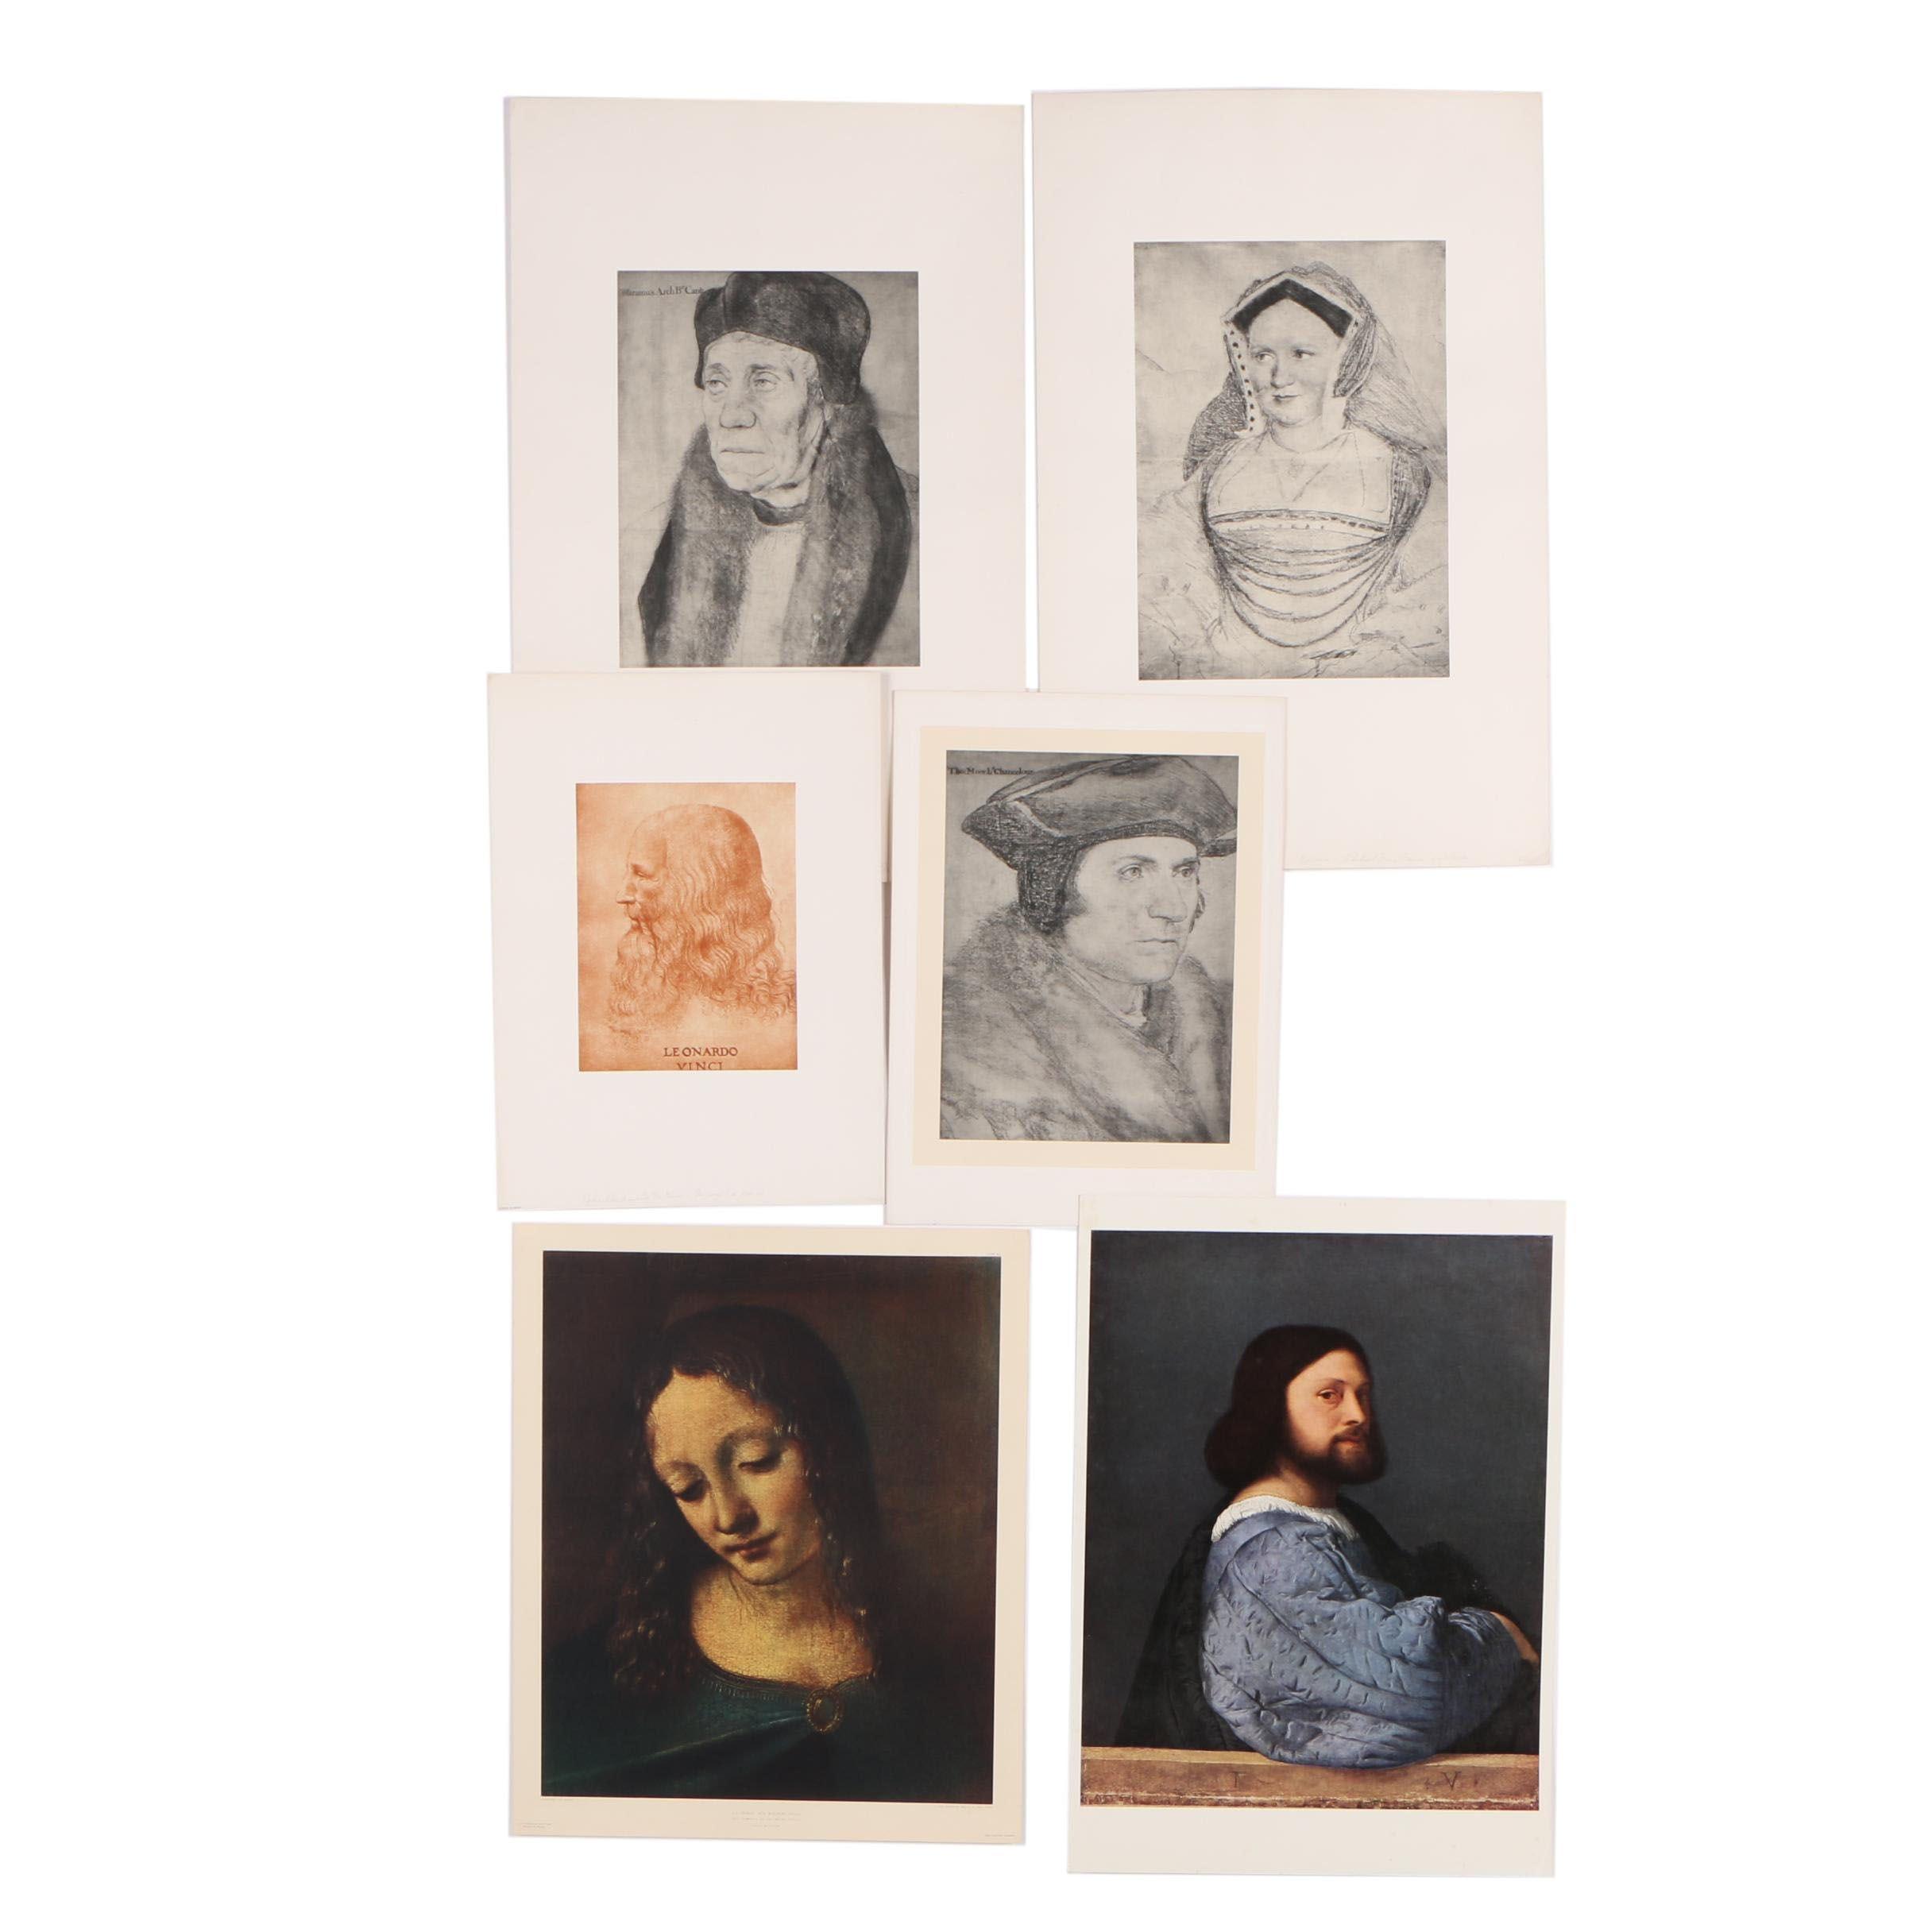 Reproduction Prints after Leonardo Da Vinci, Hans Holbein and Tiziano Titian